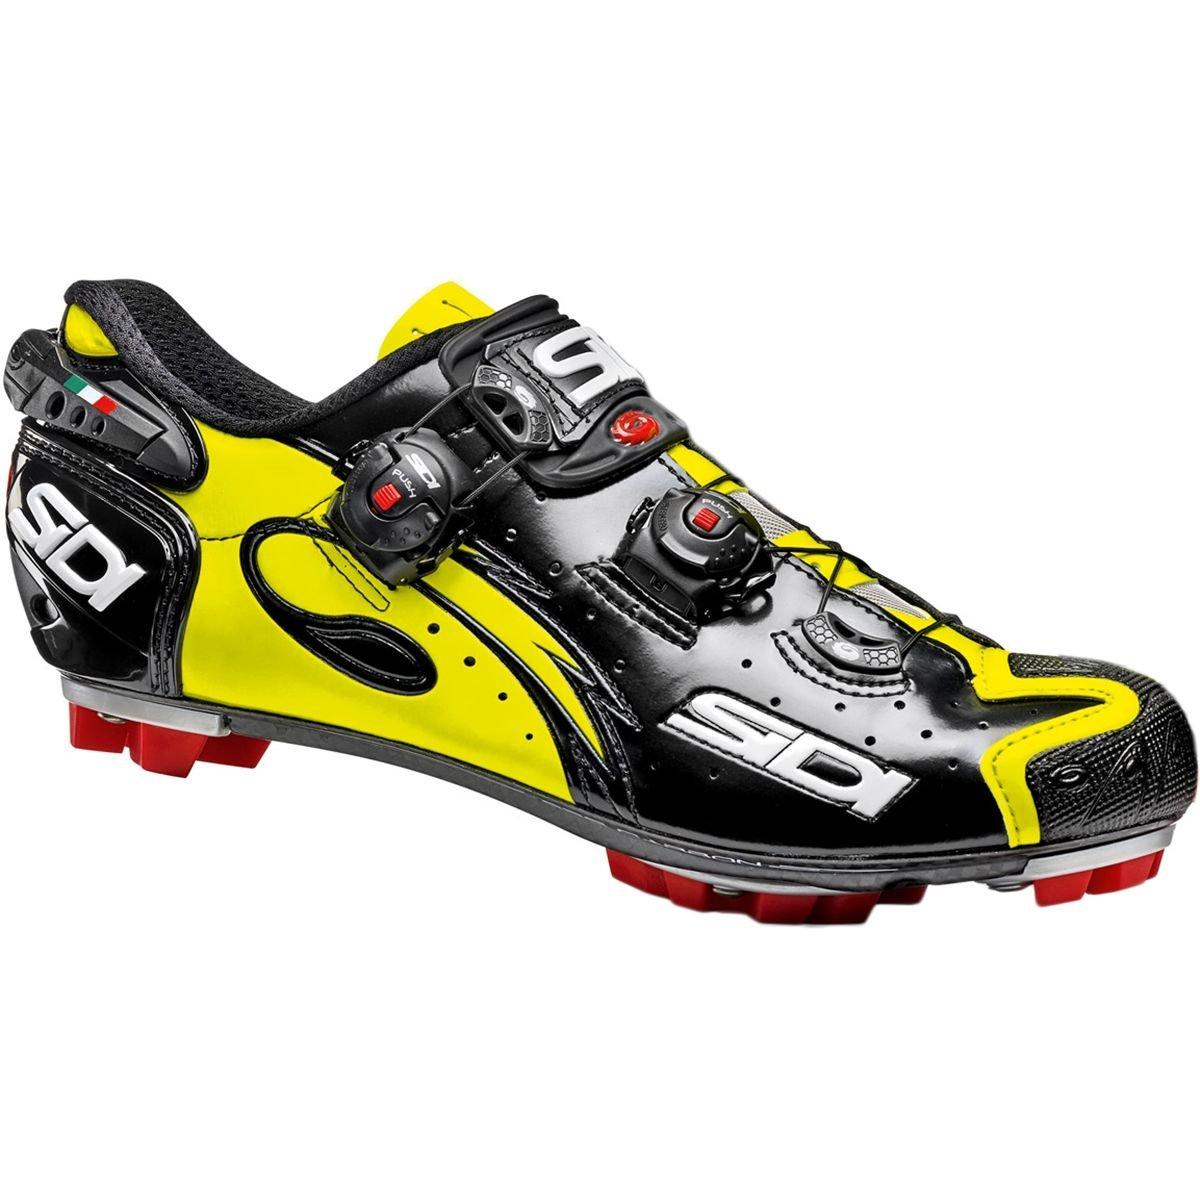 Kaos Road Bike Bicycle Cycling Shoes Yellow Fluo-Black SIDI